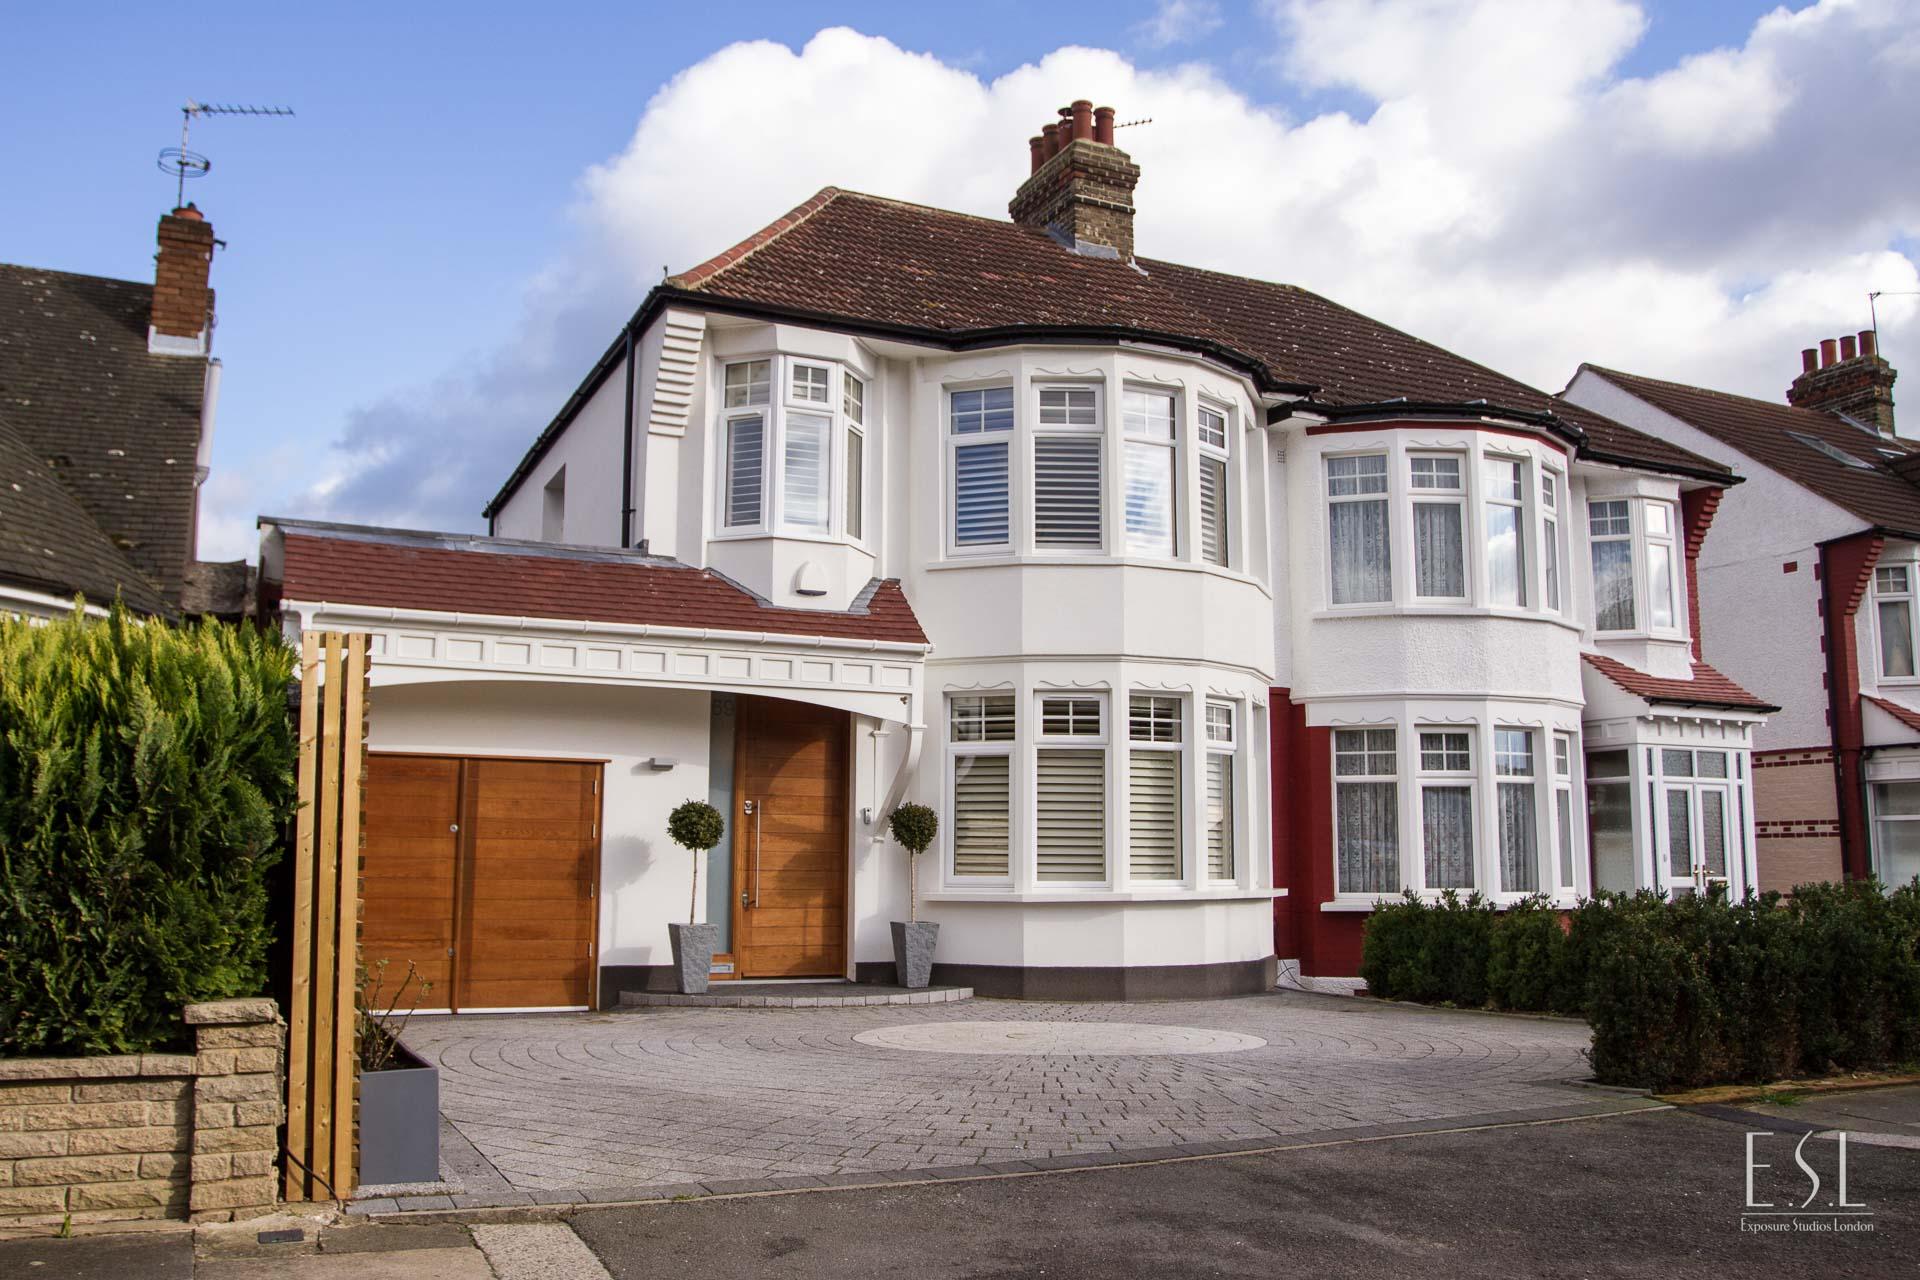 Builders, Winchmore Hill, London House rennovation & Refurbishment 01